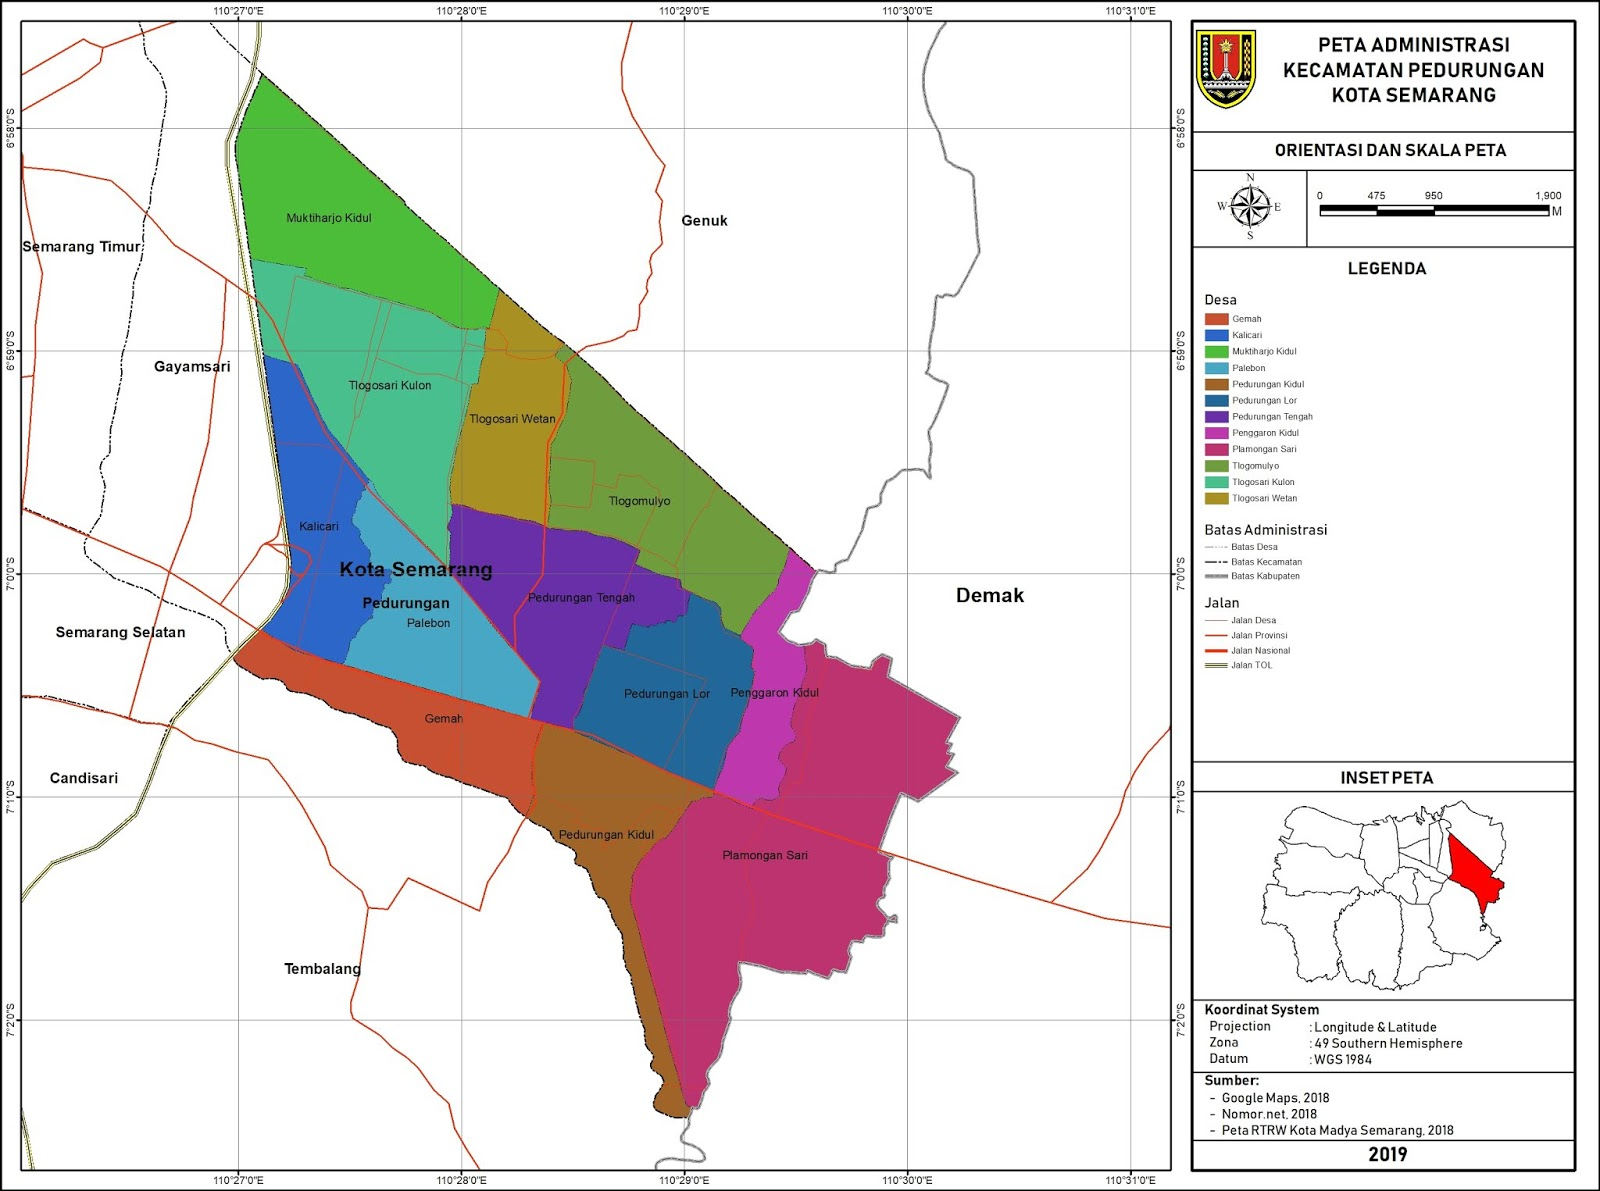 Peta Administrasi Kecamatan Pedurungan, Kota Semarang ...